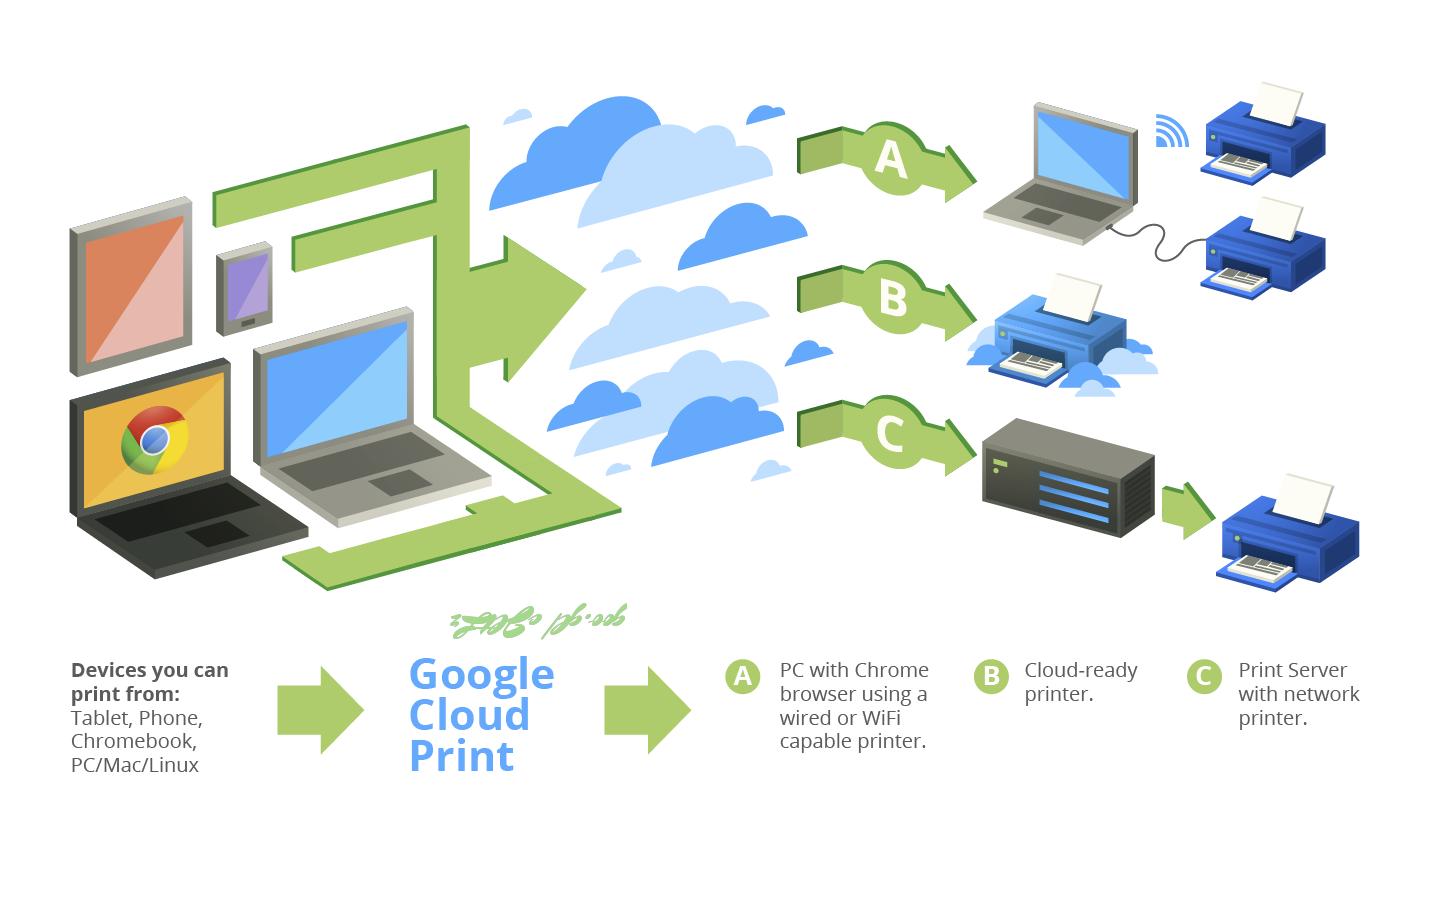 Cara Kerja Google Cloud Print